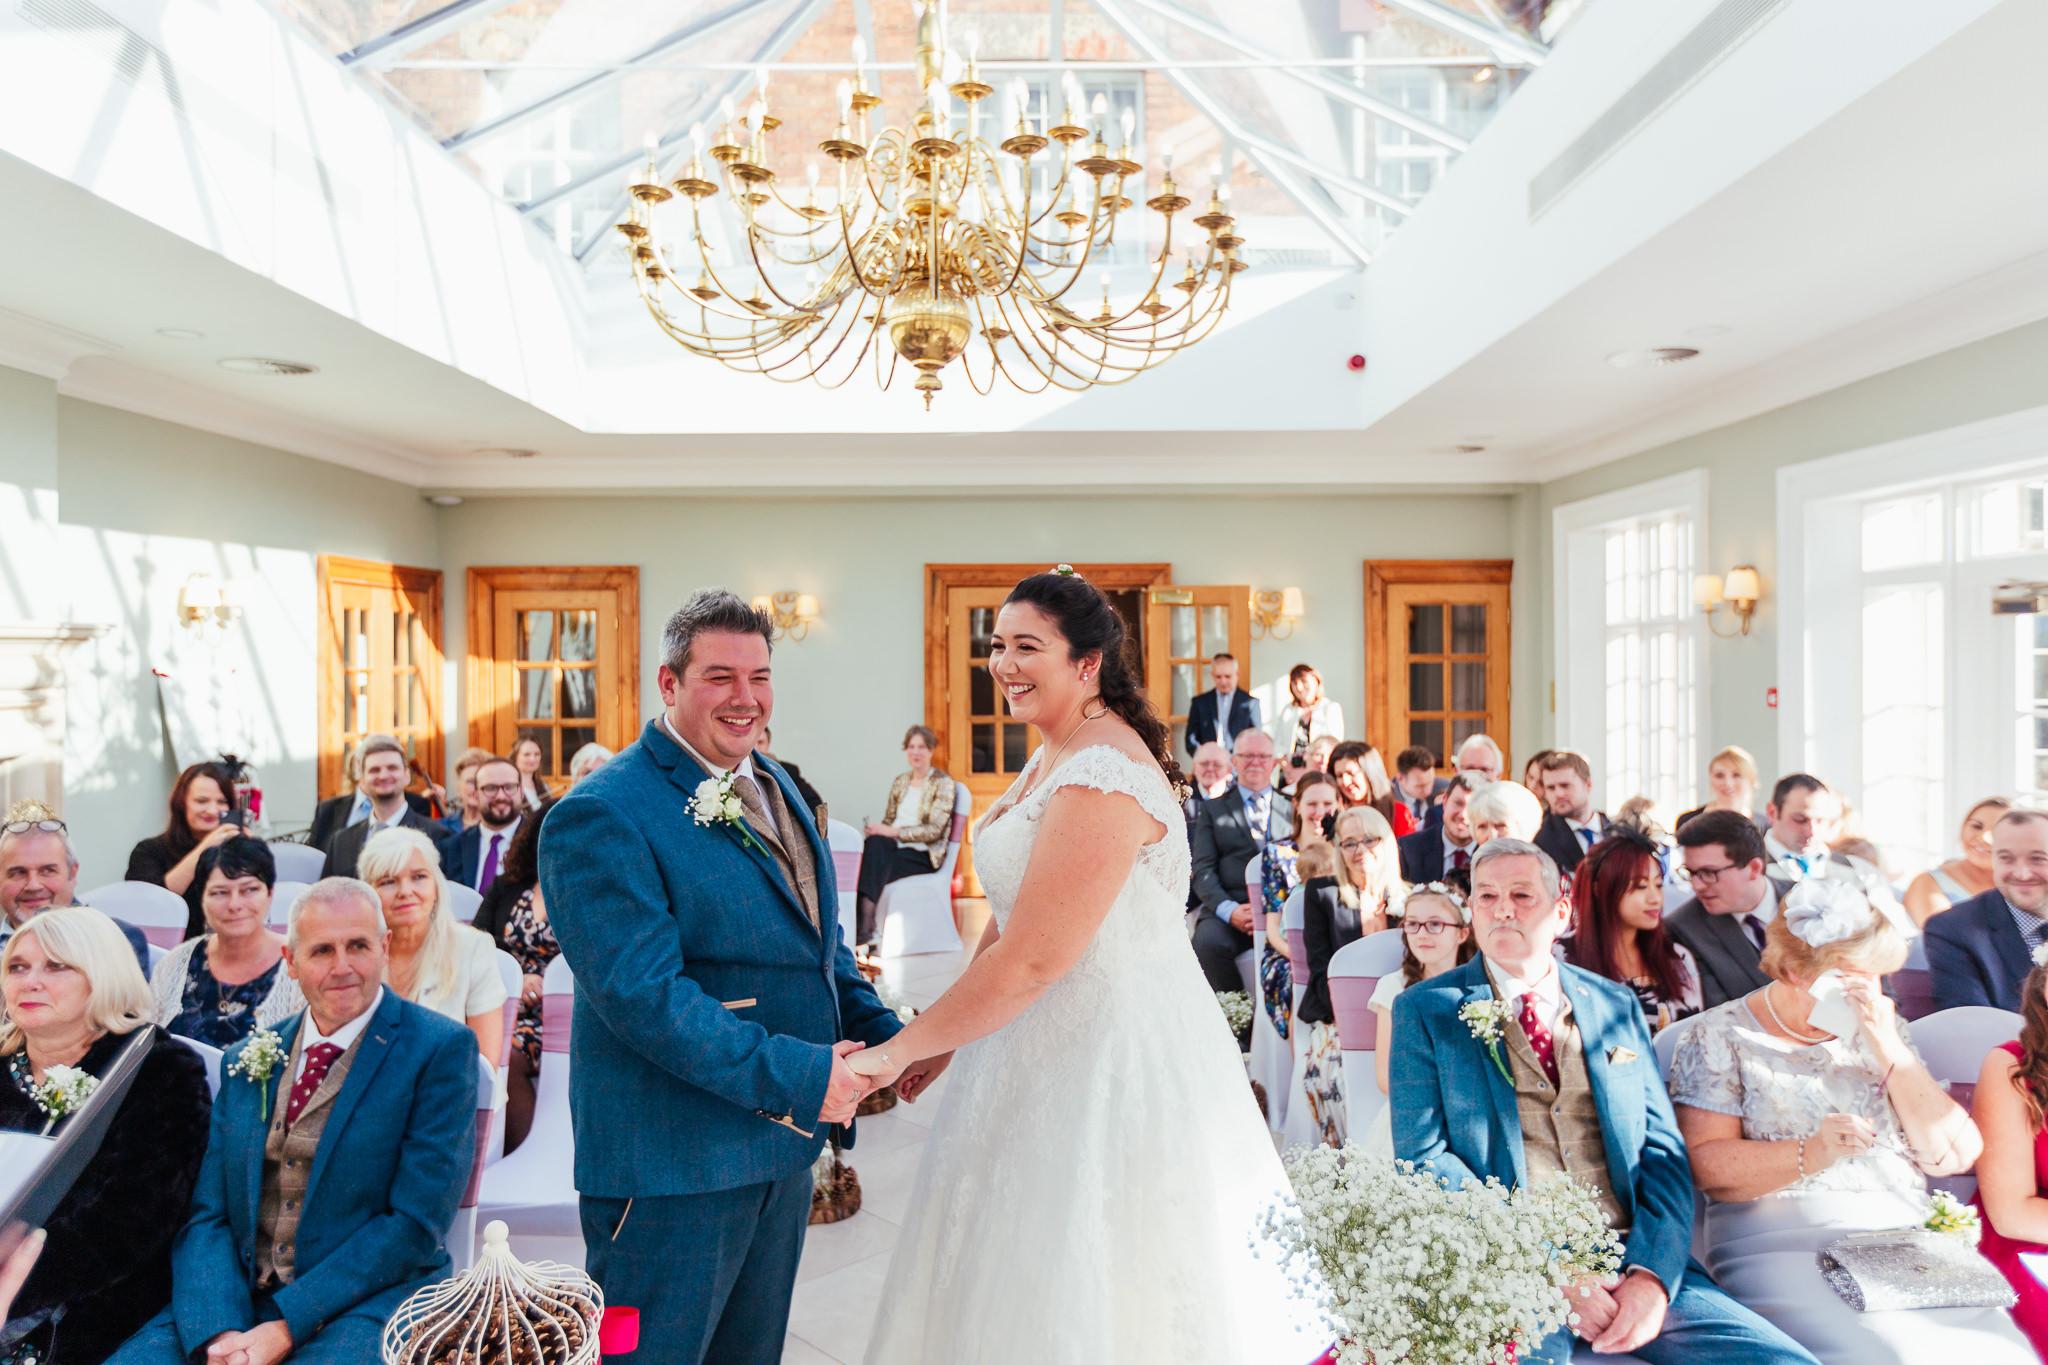 Willington-Hall-Cheshire-Wedding-18.jpg